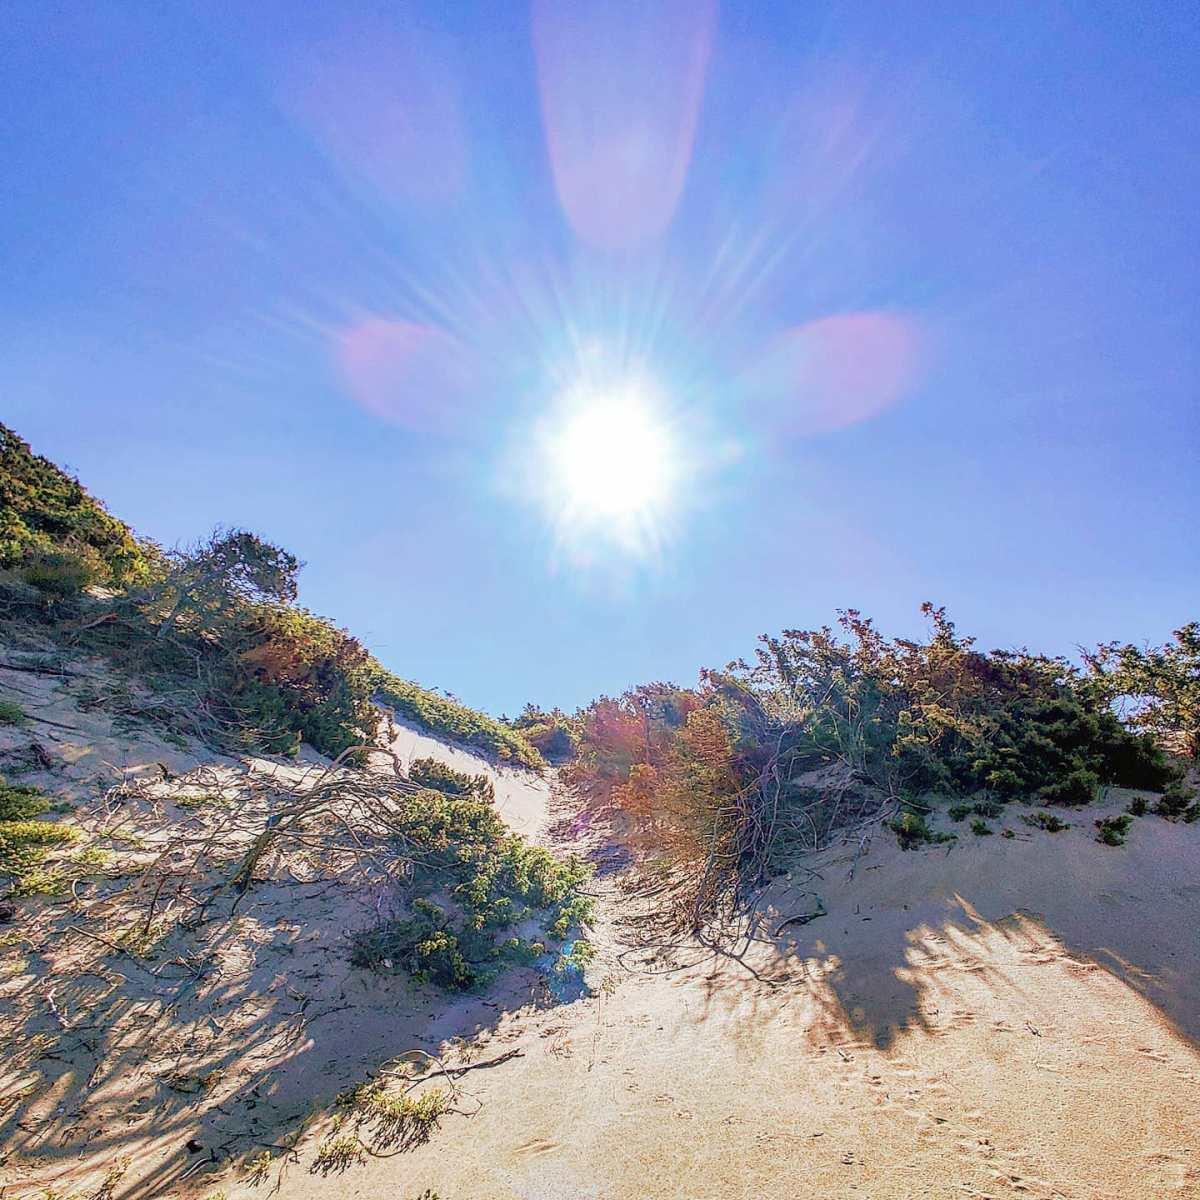 Dunes life 🏜️😎🤙#sabaudia #italy #Italia #sand #nature #travelphotography #travelgram #beach #traveler #beachvibes #travelling #traveling #beachlife #traveller #travelblogger #naturelovers #naturephotography #travel #sun #sunglare #dunes #dune #spiaggia #nature